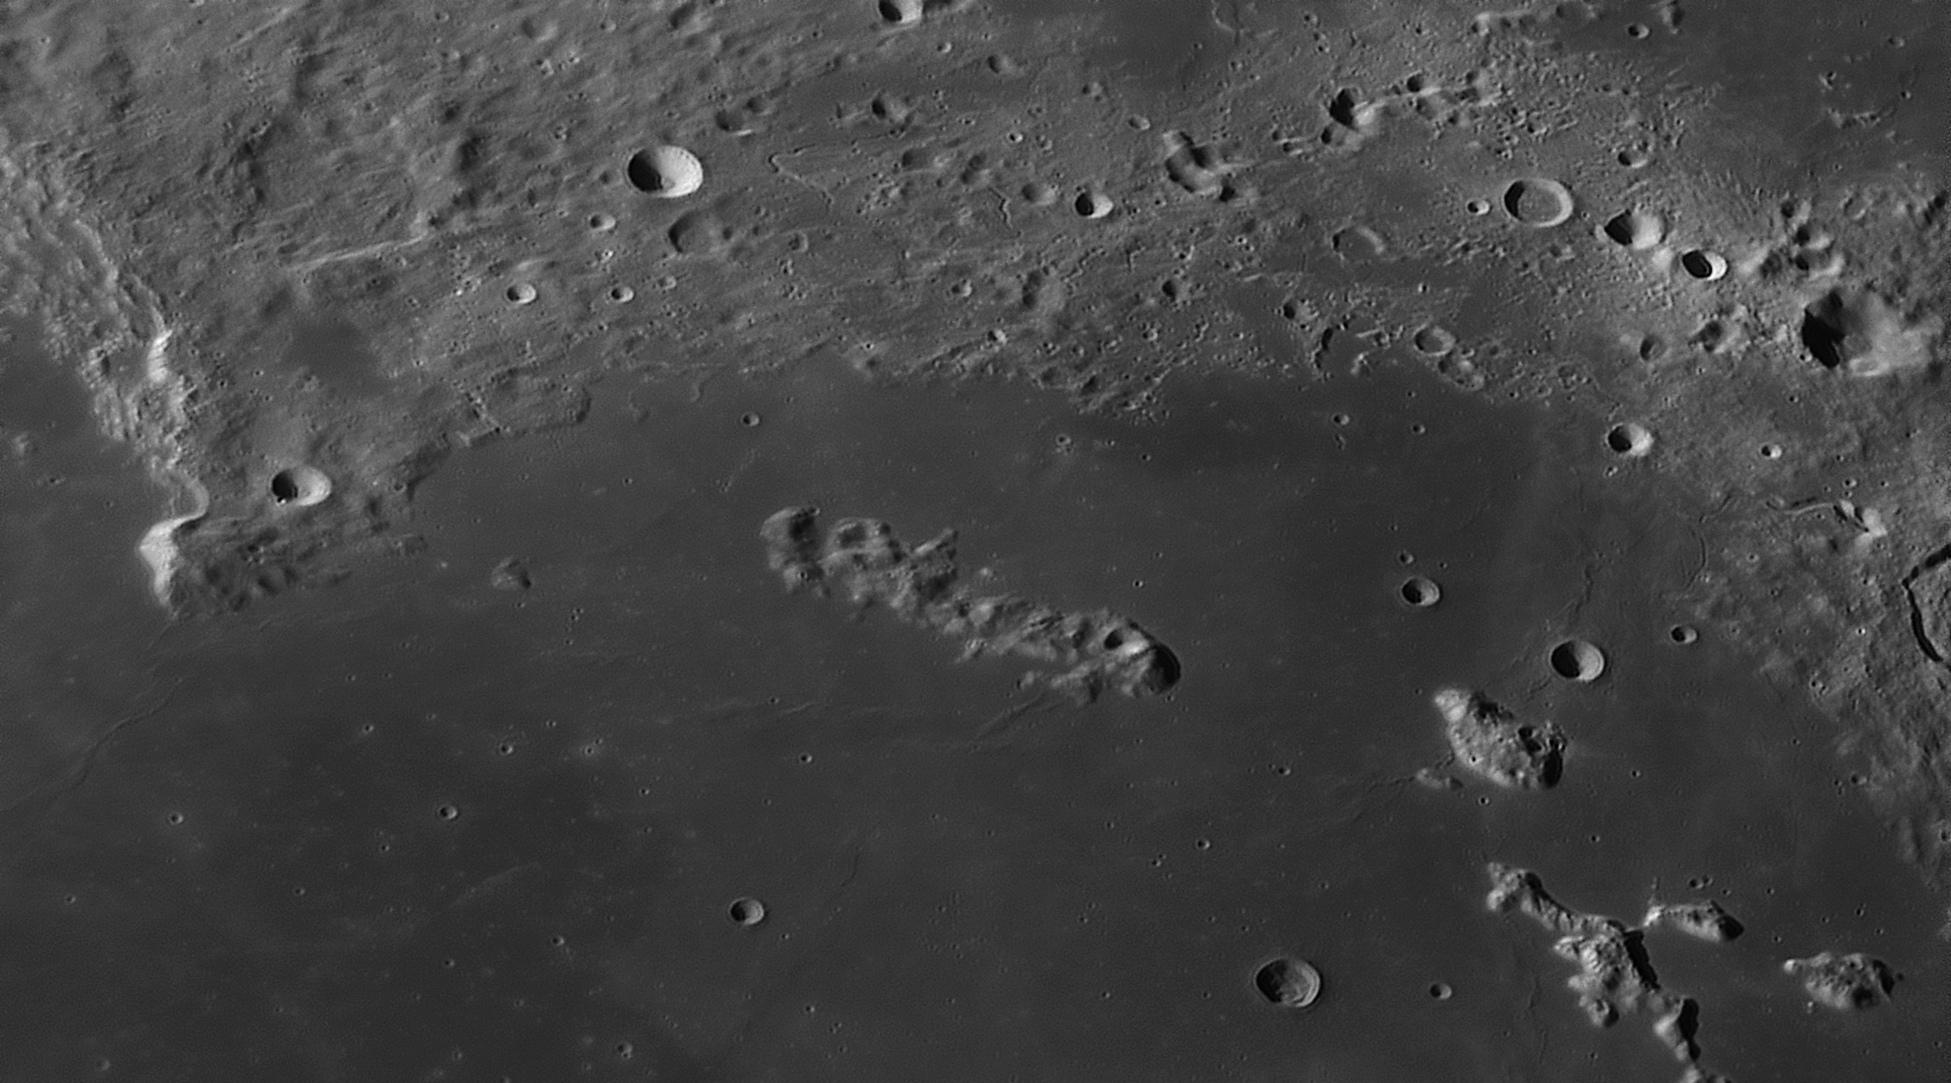 moon_23_07_2019_03_50_52_FINALE2.jpg.bcf5fb72a93b2ce536f217f0f9d52b5a.jpg